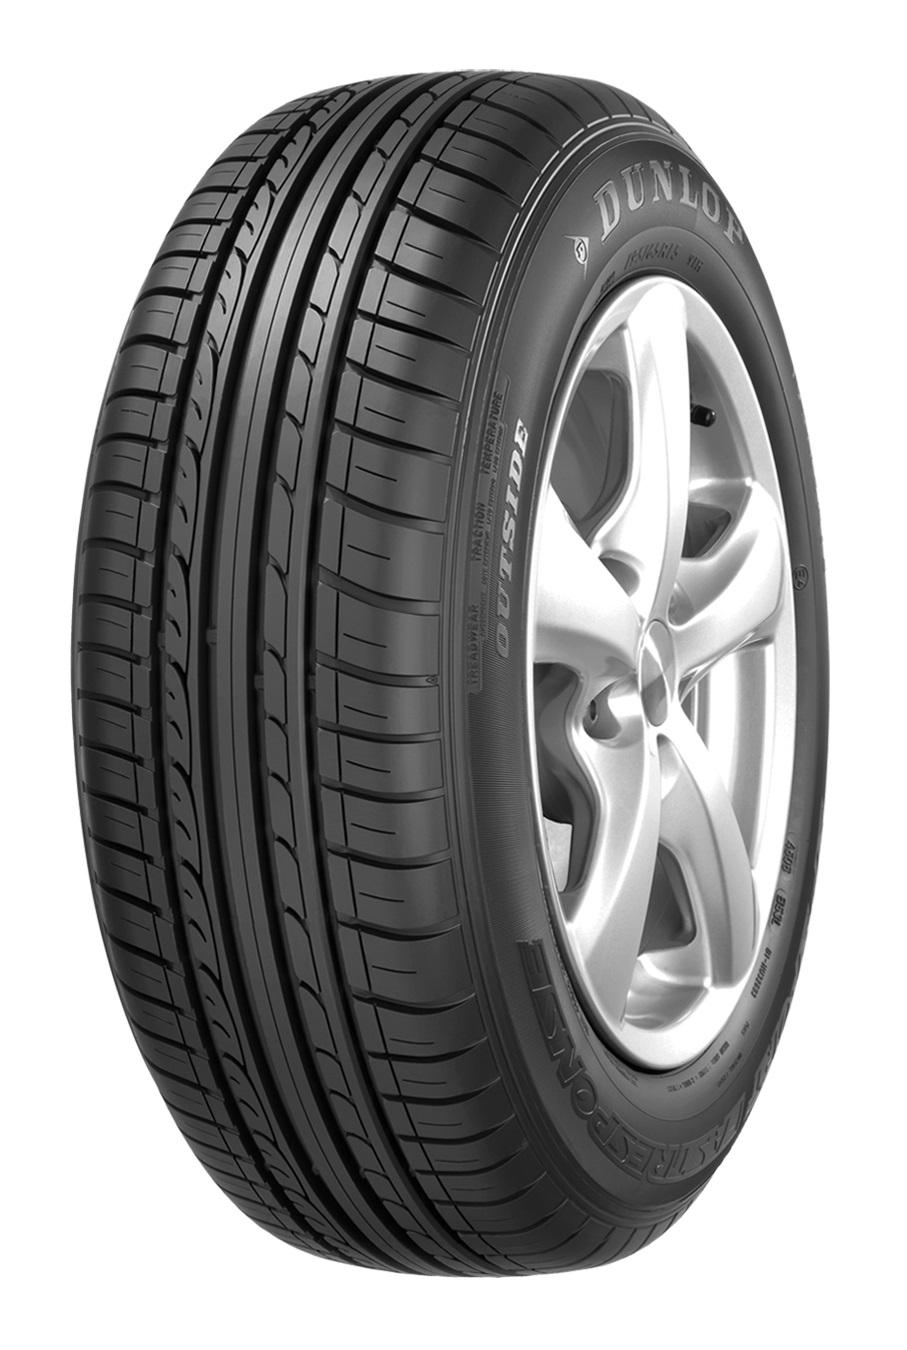 Dunlop 205/60R16 V FastResponse DOT11 DUNLOP GUMIABRONCS